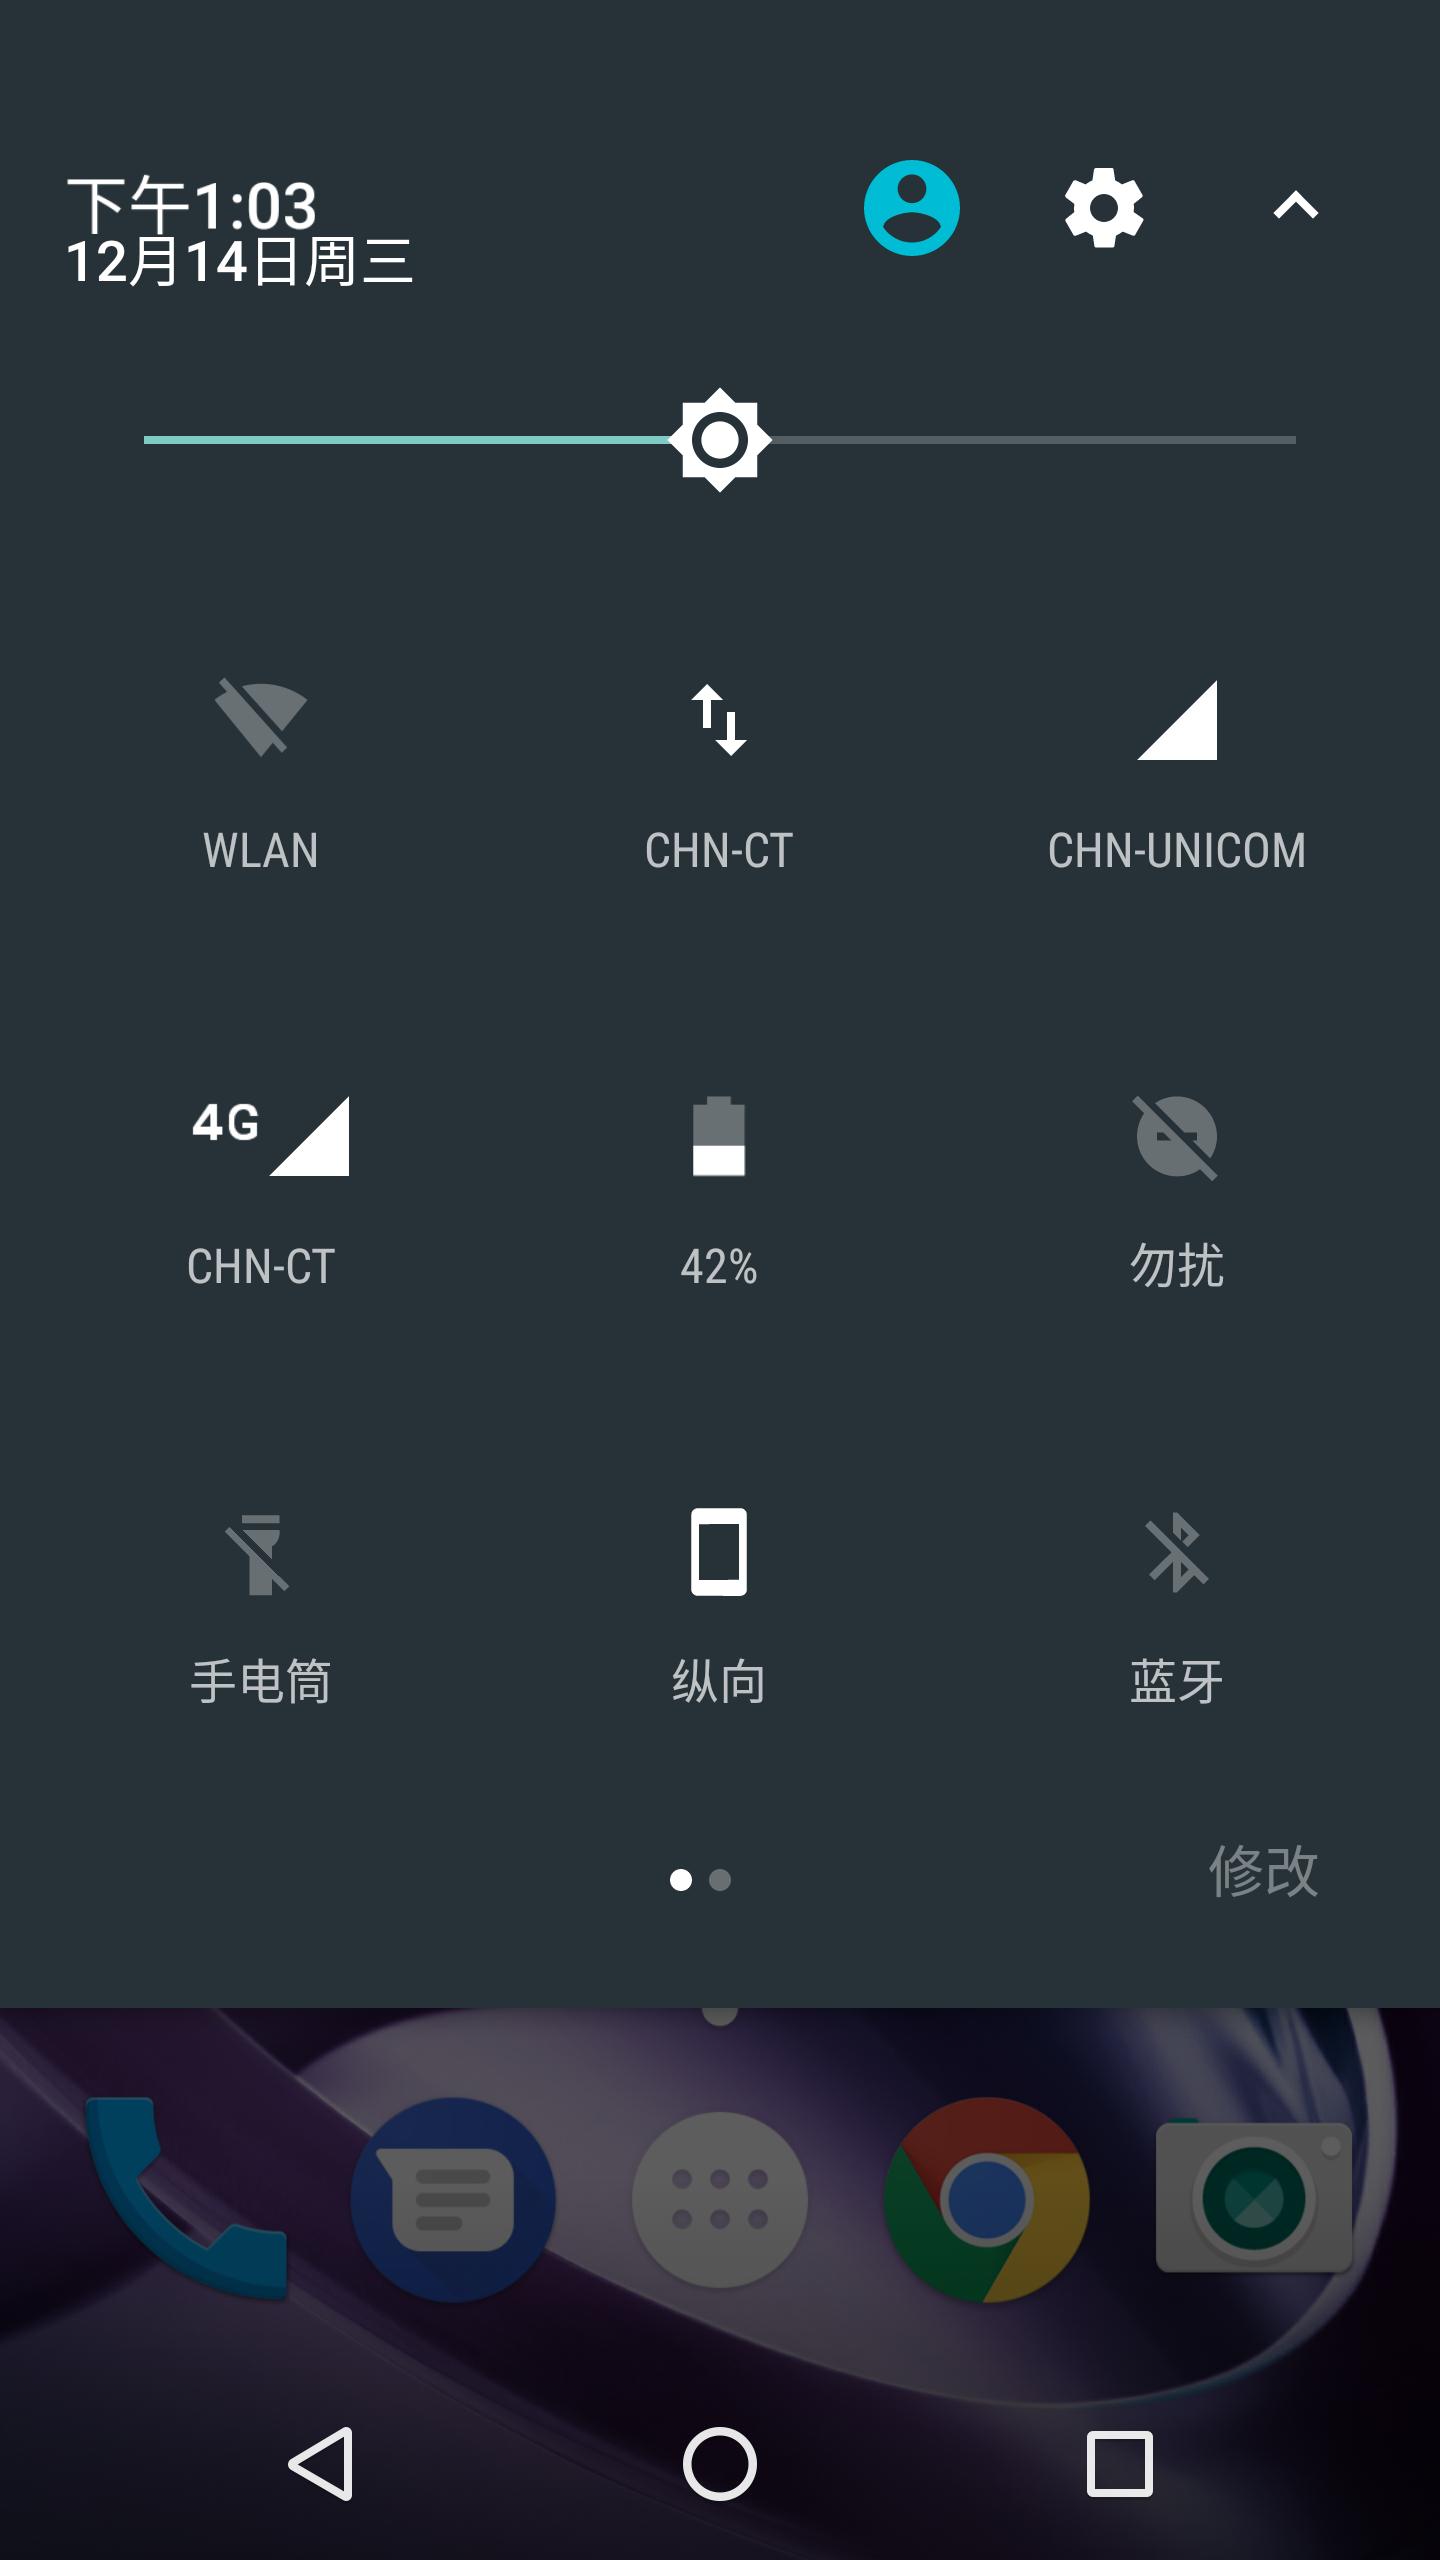 Screenshot_20161214-130304.png